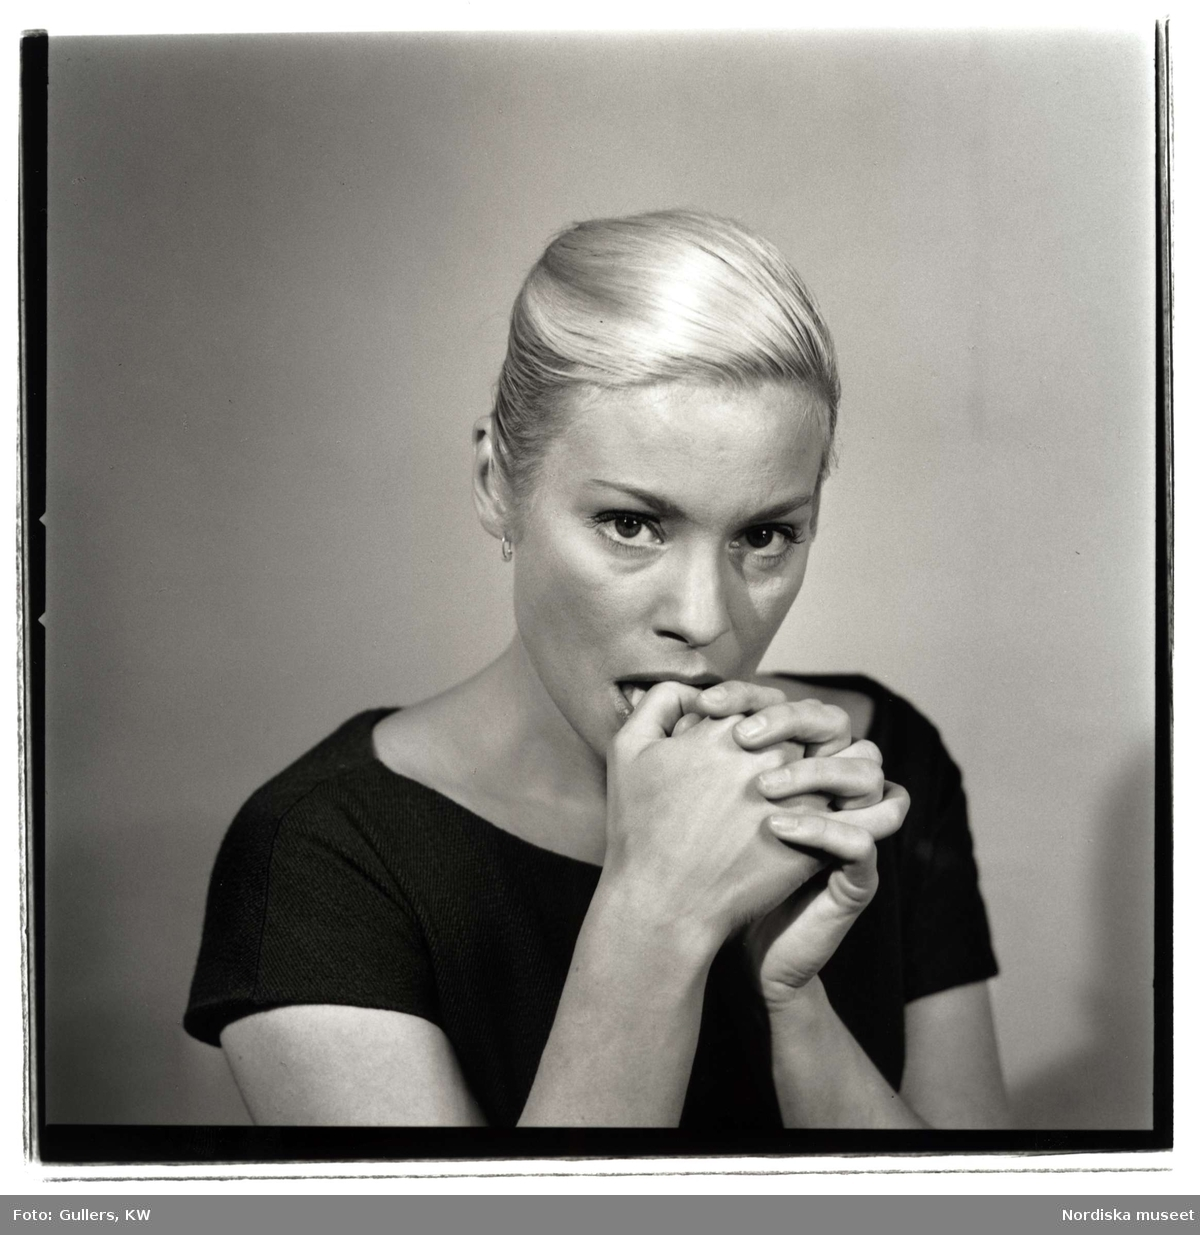 Ingrid Thulin. Fotograf: KW Gullers (Nordiska museet)